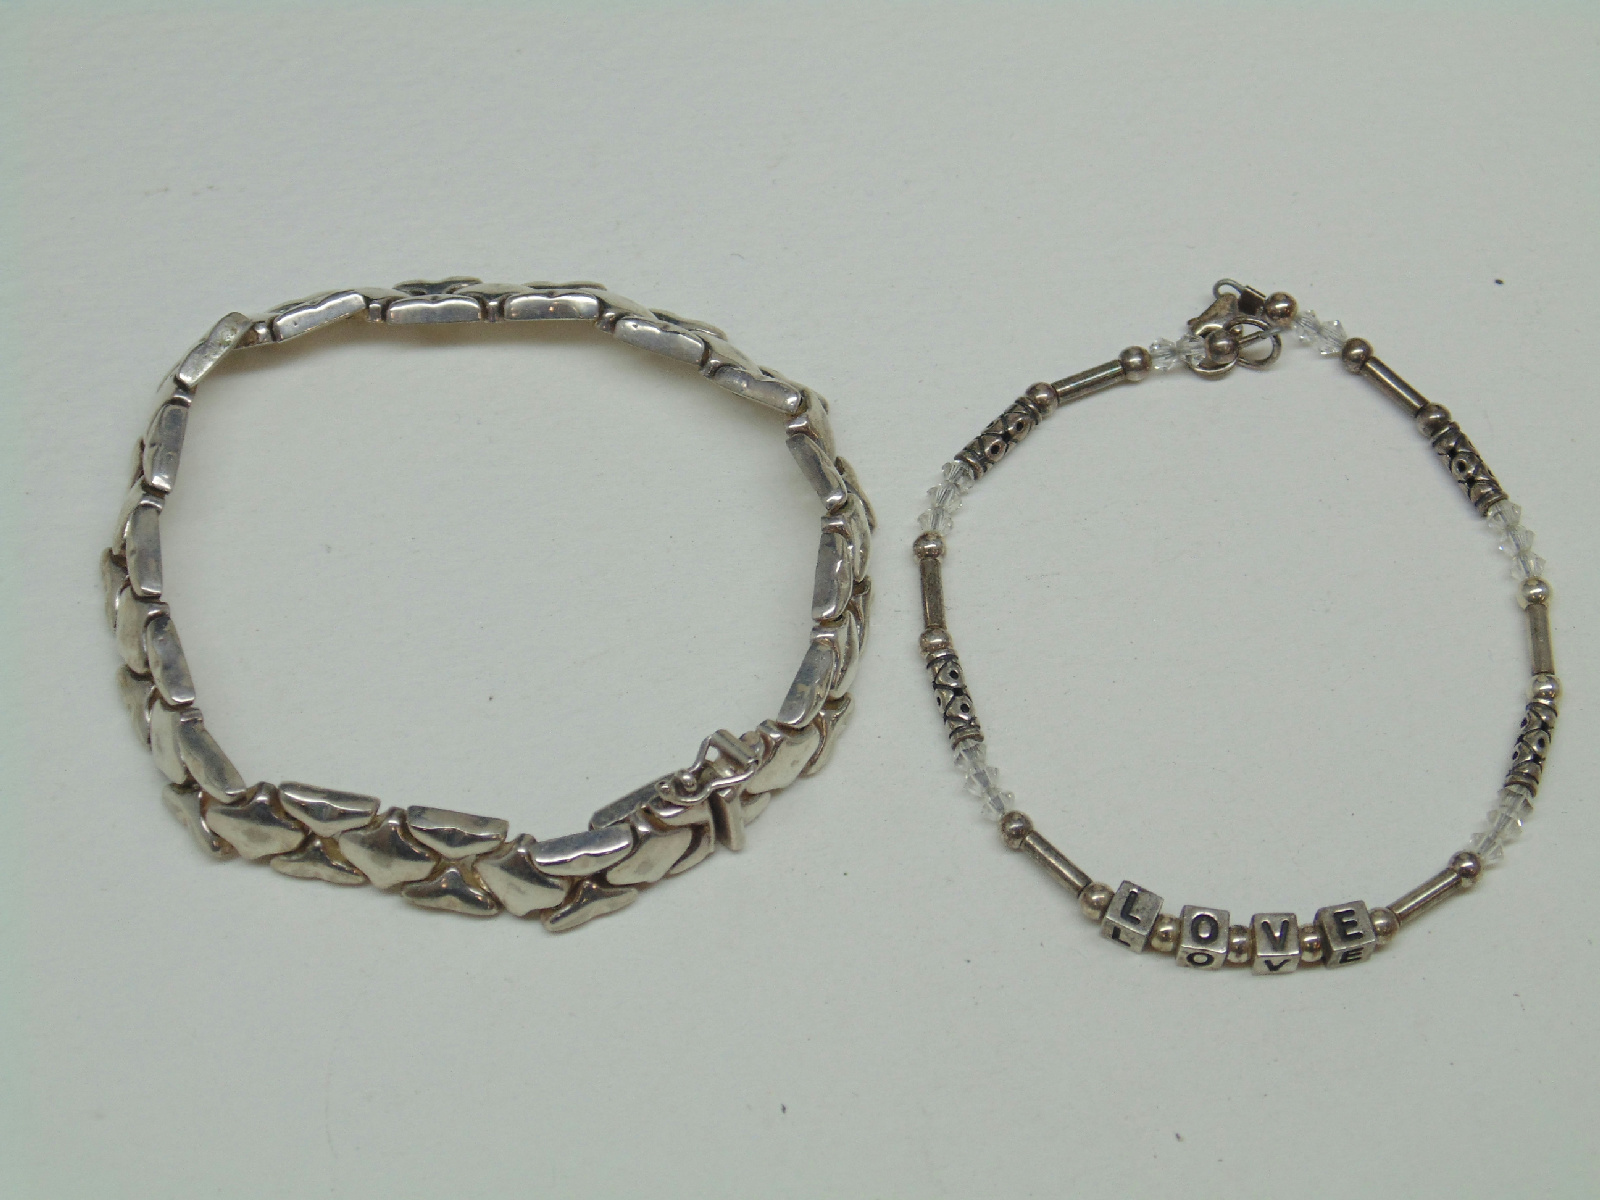 sterling silver jewelry lot failed magnet test bracelet